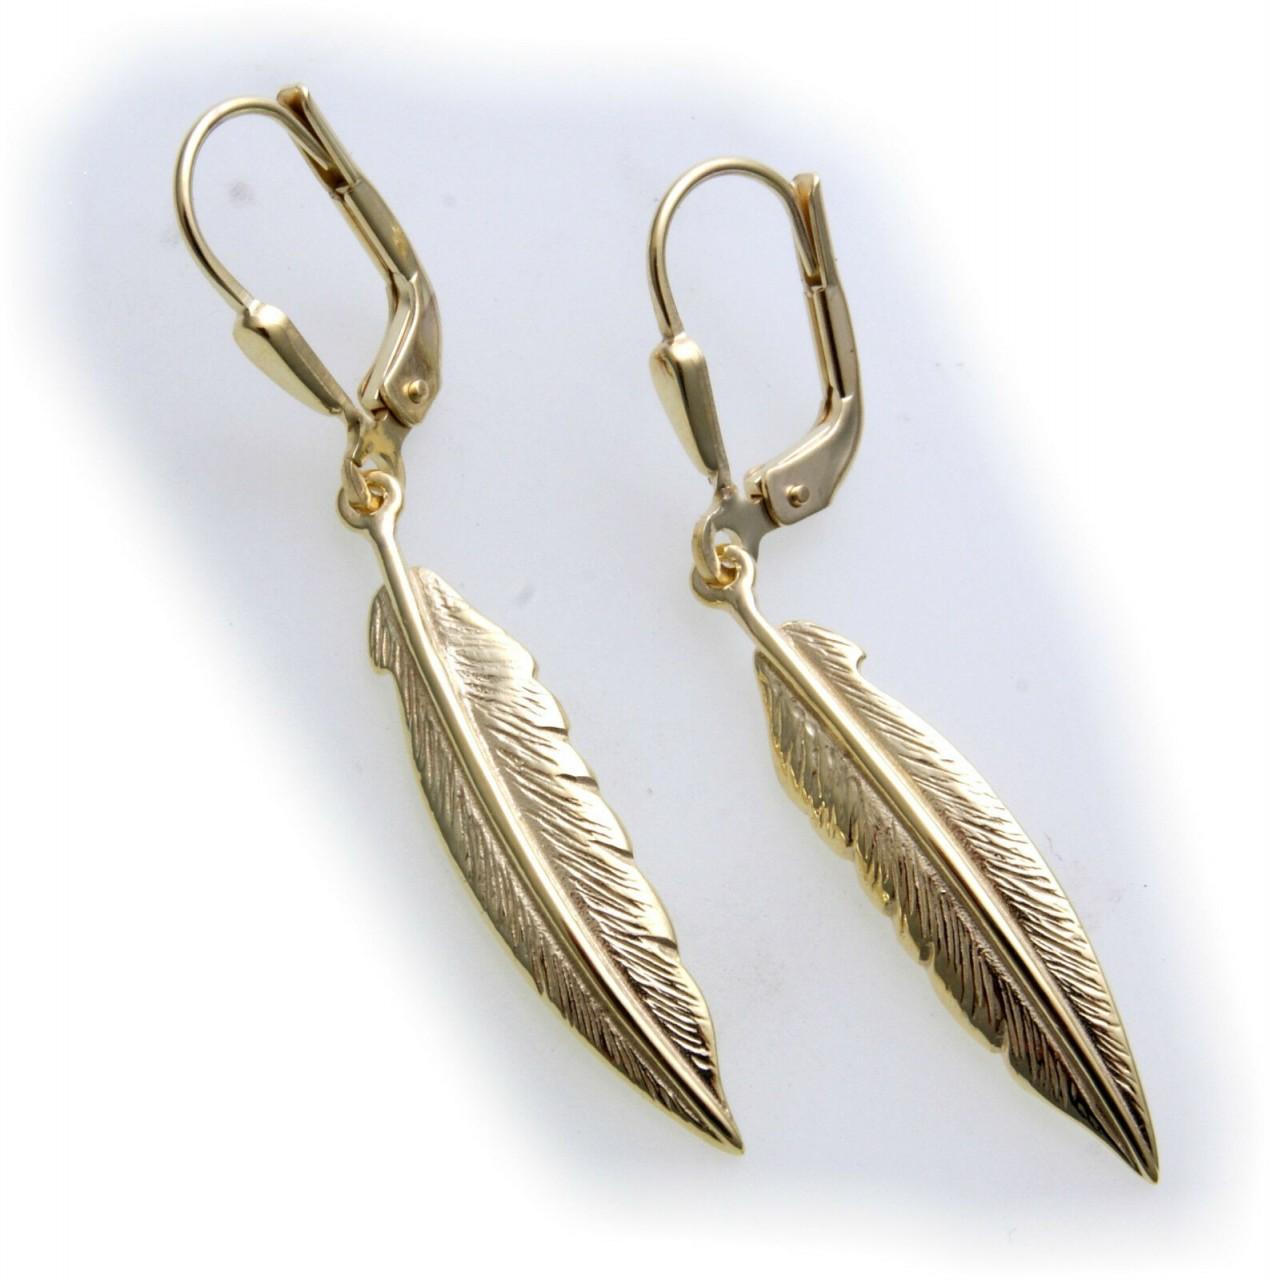 Damen Ohrringe Hänger Federn echt Gold 333 Indianer Feder Ohrhänger 8kt Gelbgold